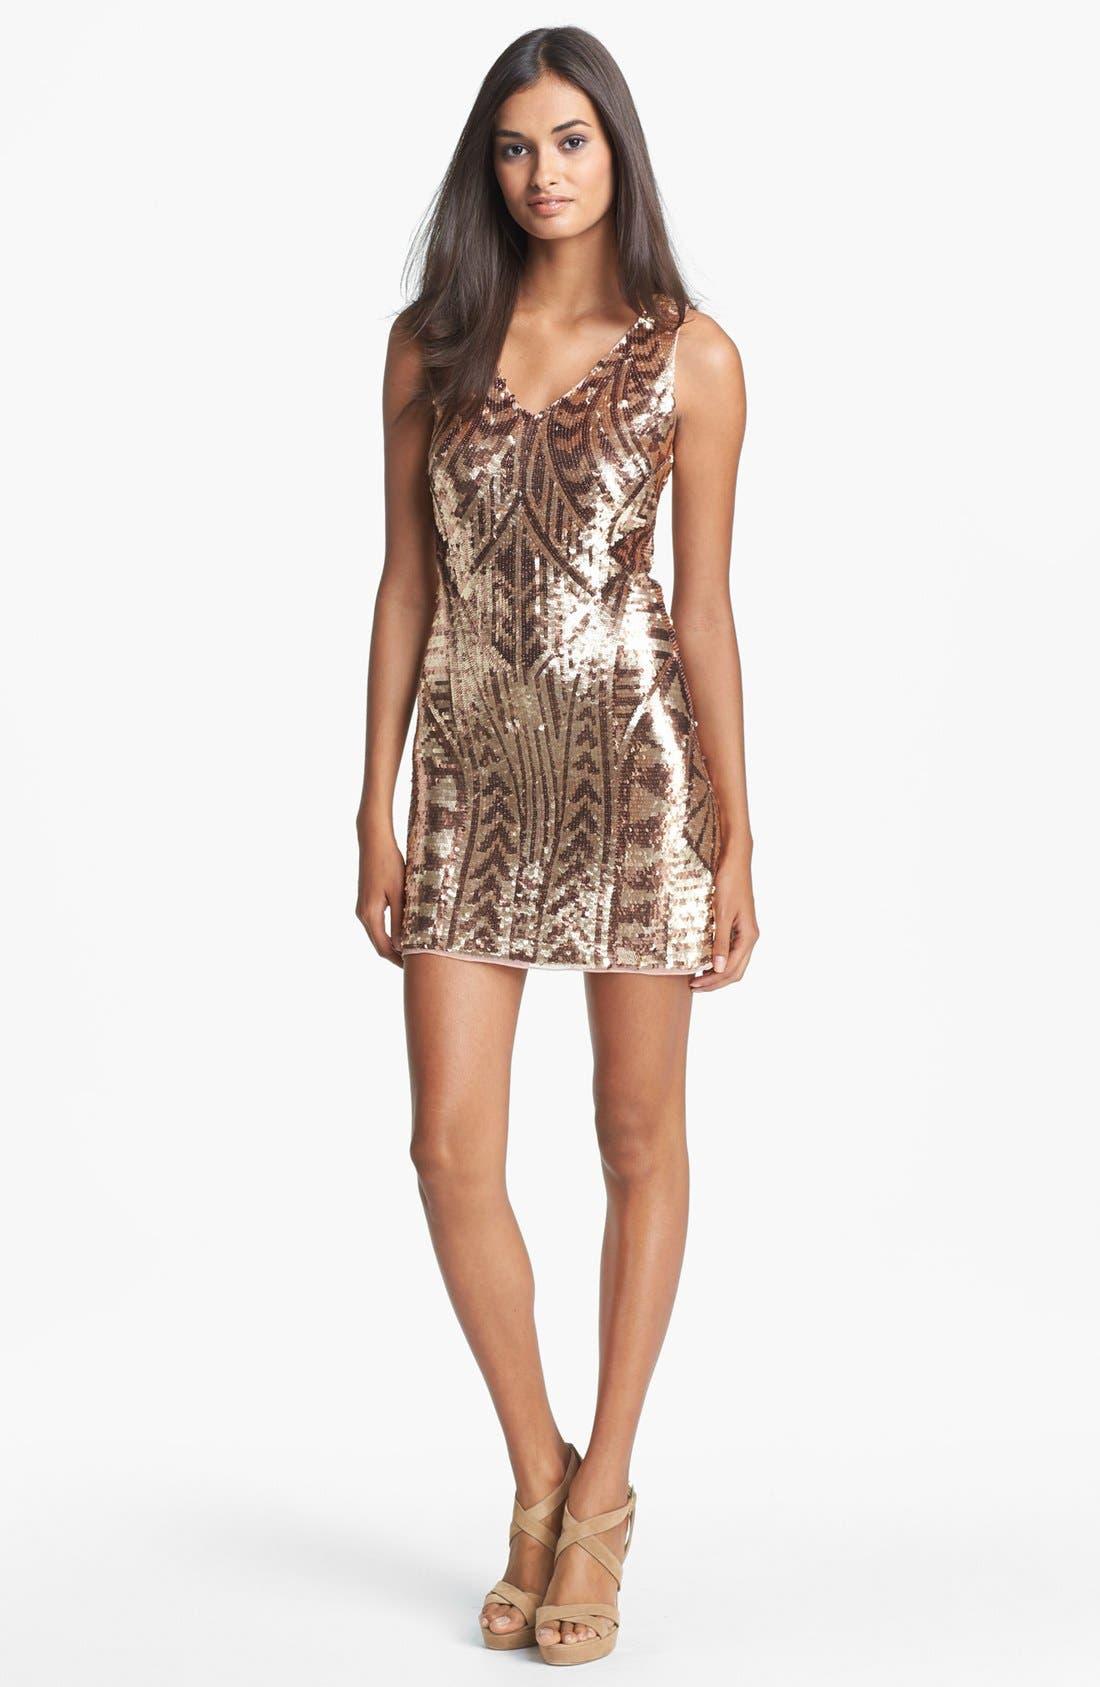 Alternate Image 1 Selected - Aidan Mattox Sequin Minidress (Online Only)